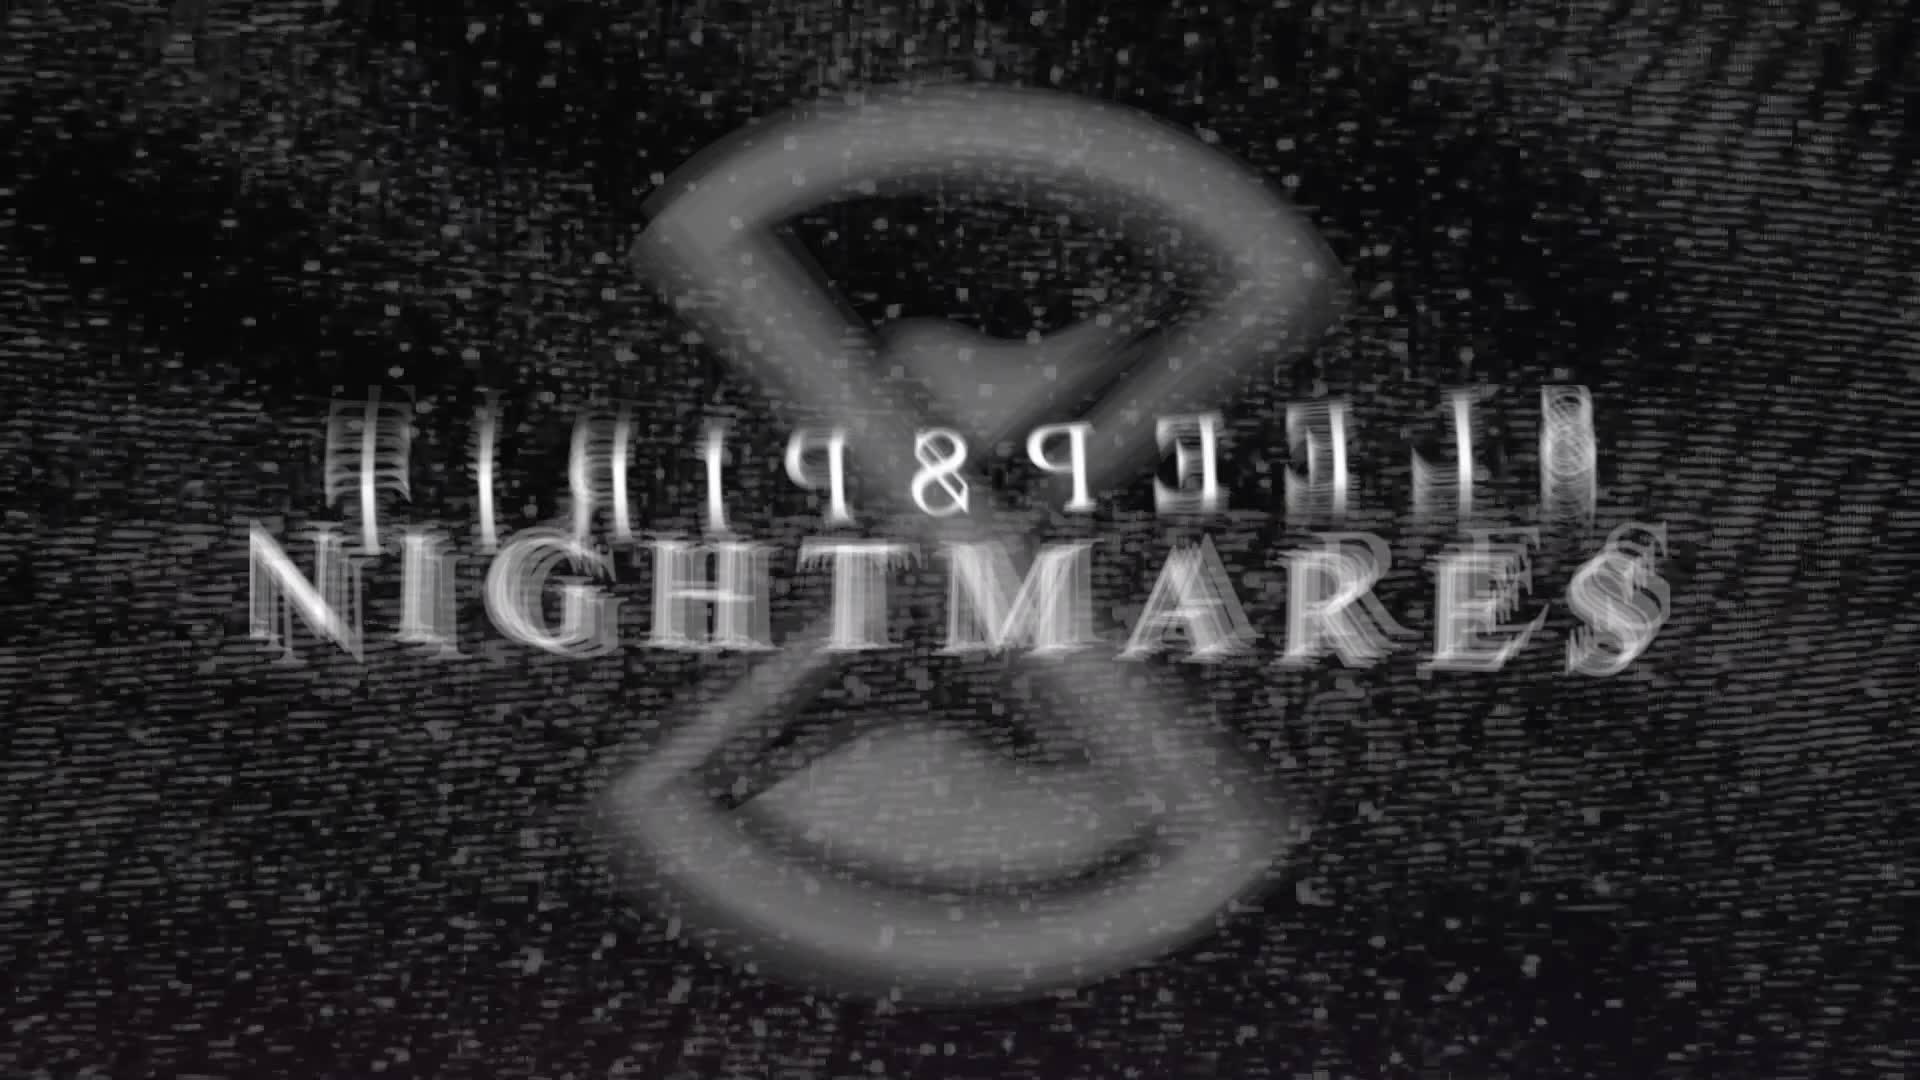 SLEEPSPIRIT - Nightmares (Live Performance Video)